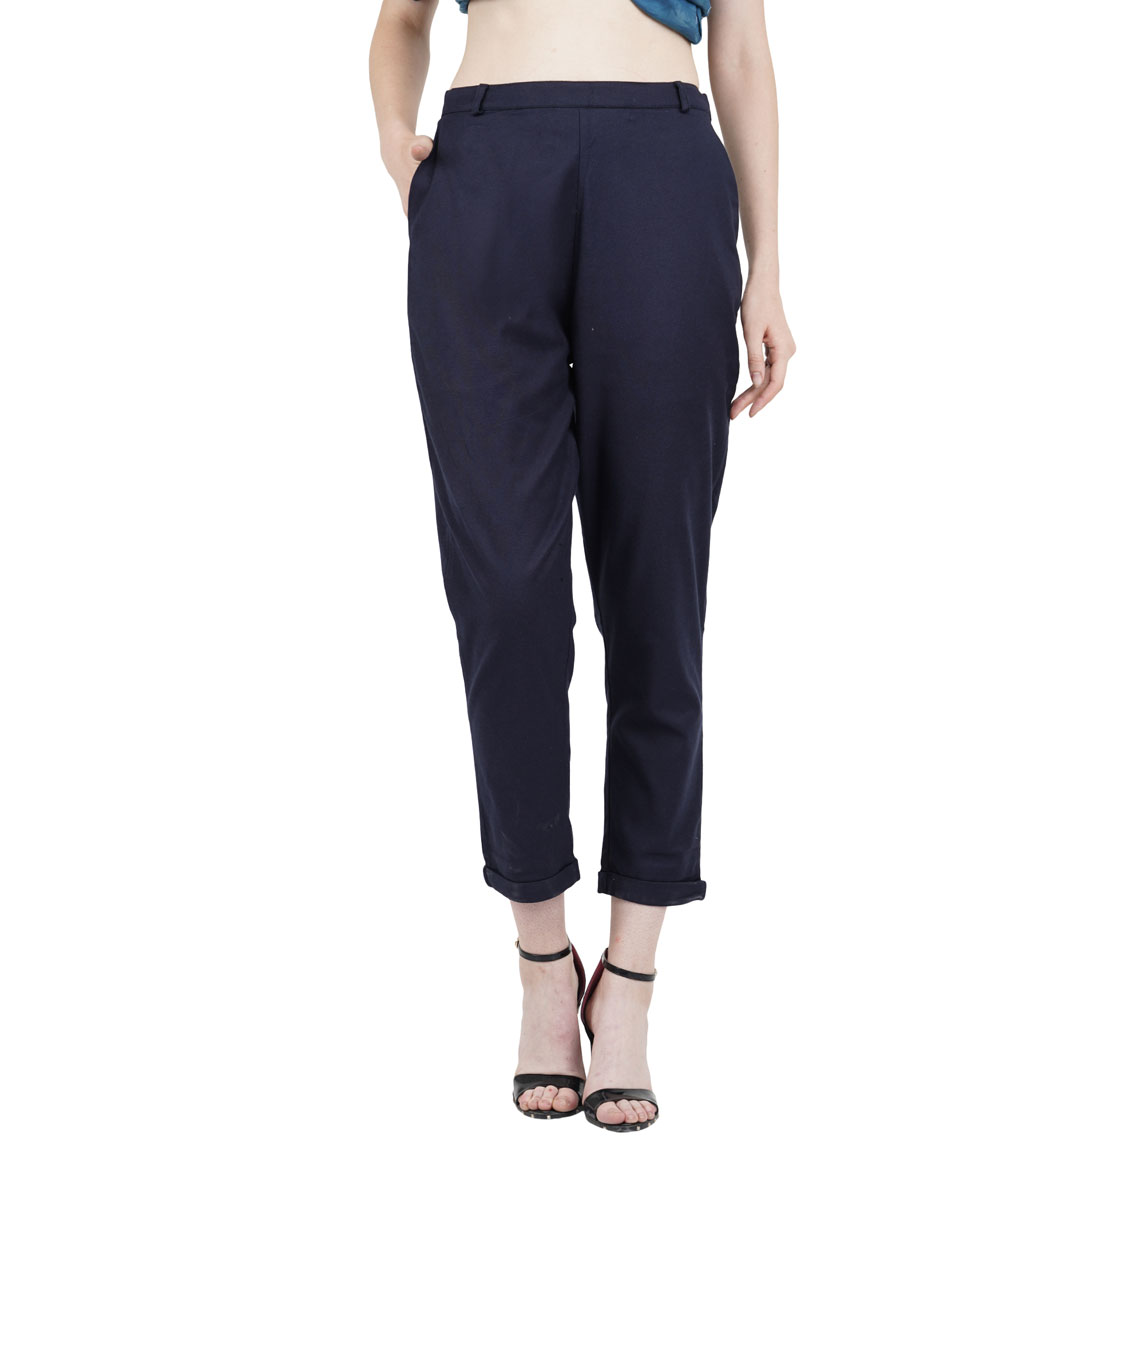 Clothsey Pant